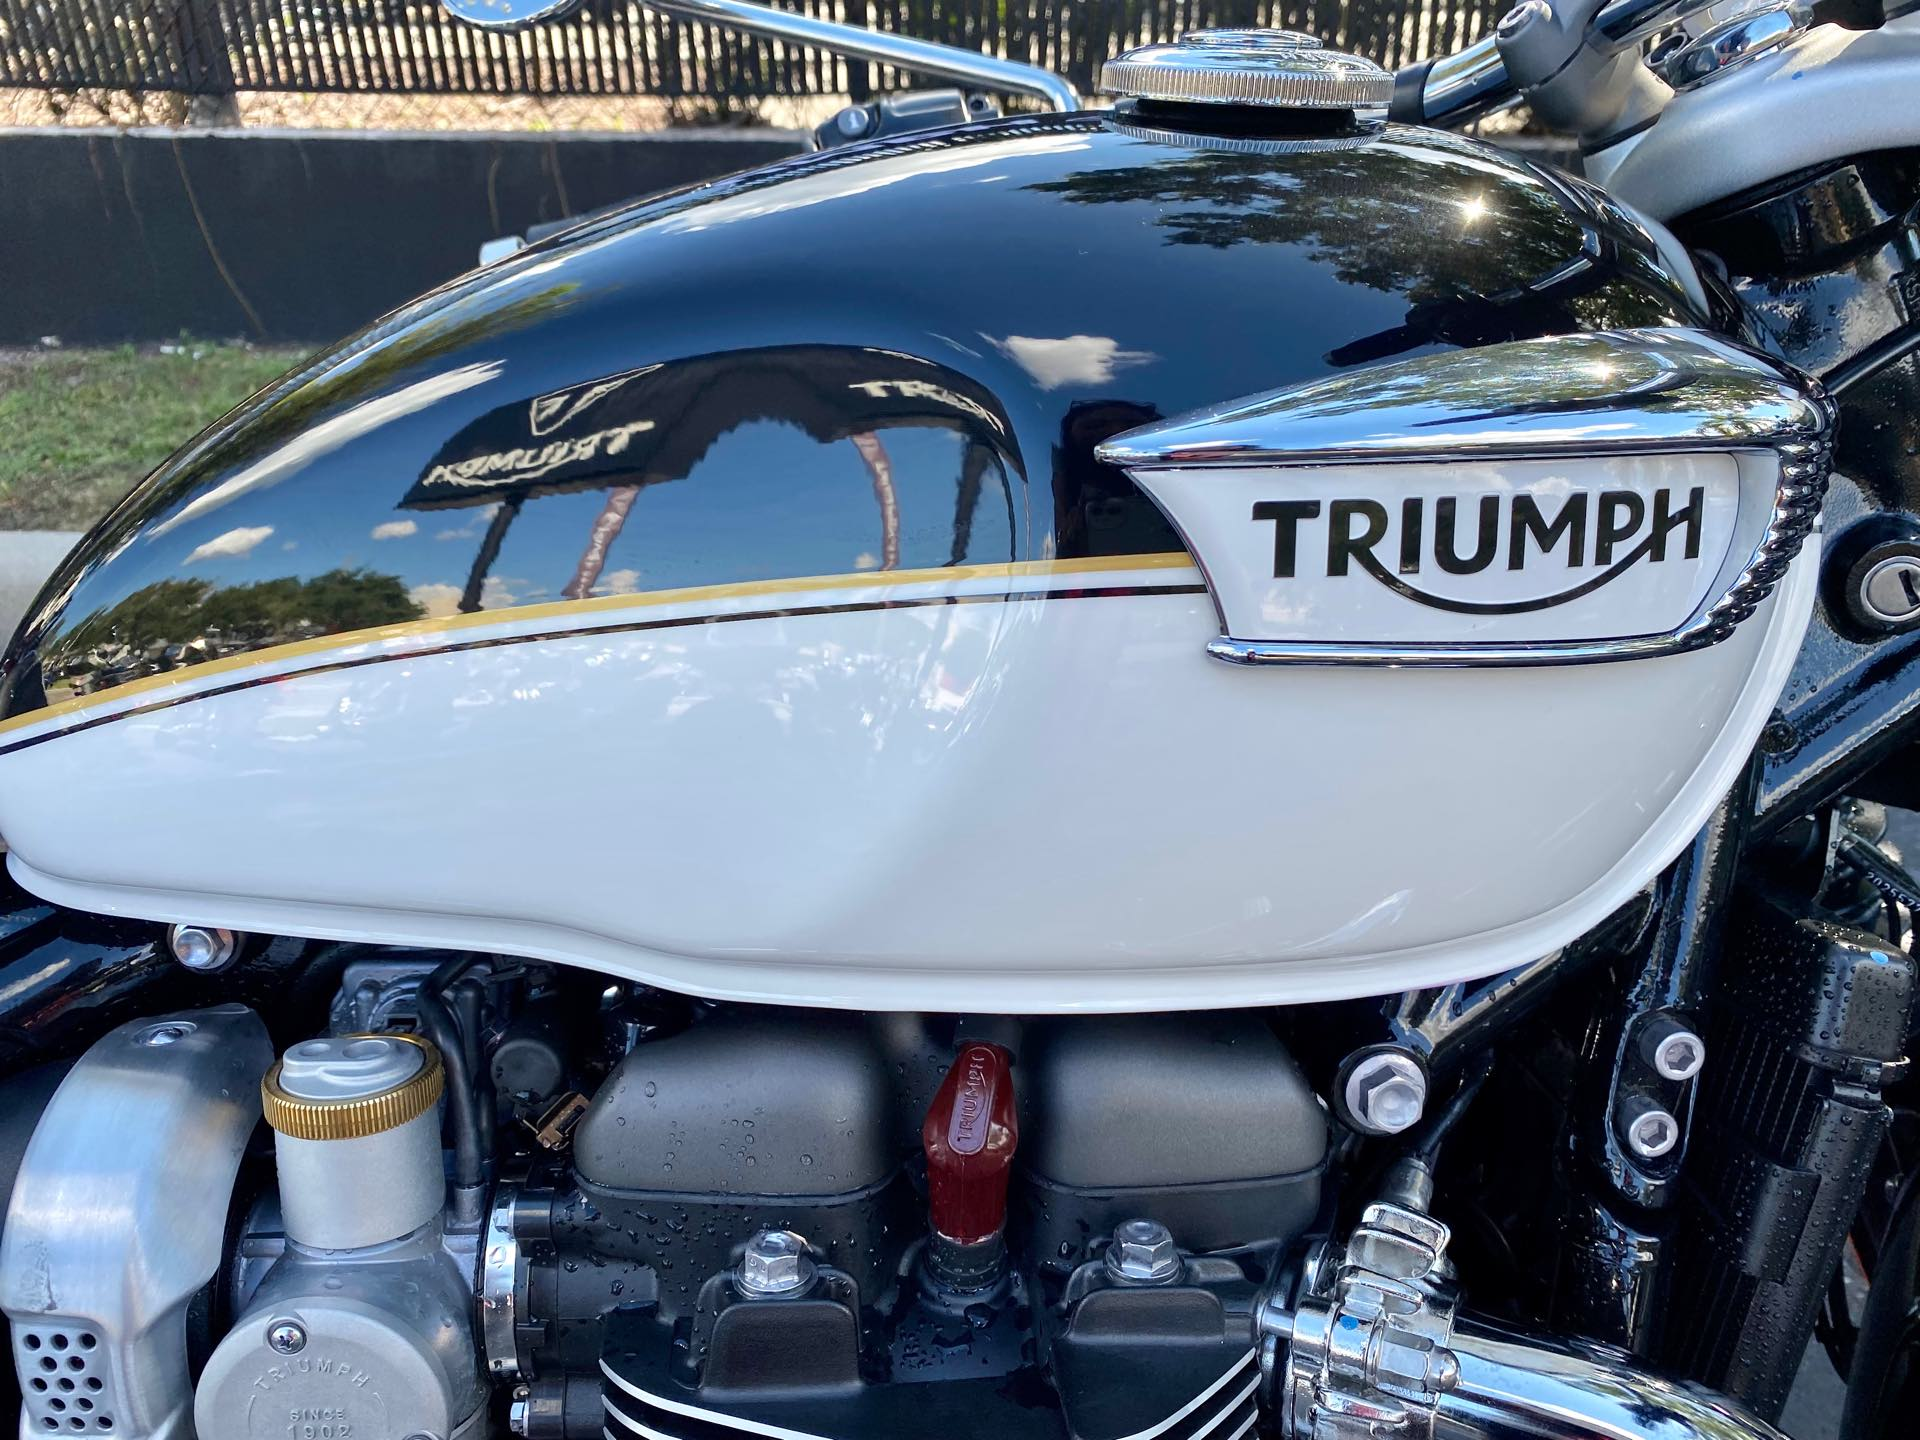 2022 Triumph Bonneville Speedmaster Base at Tampa Triumph, Tampa, FL 33614